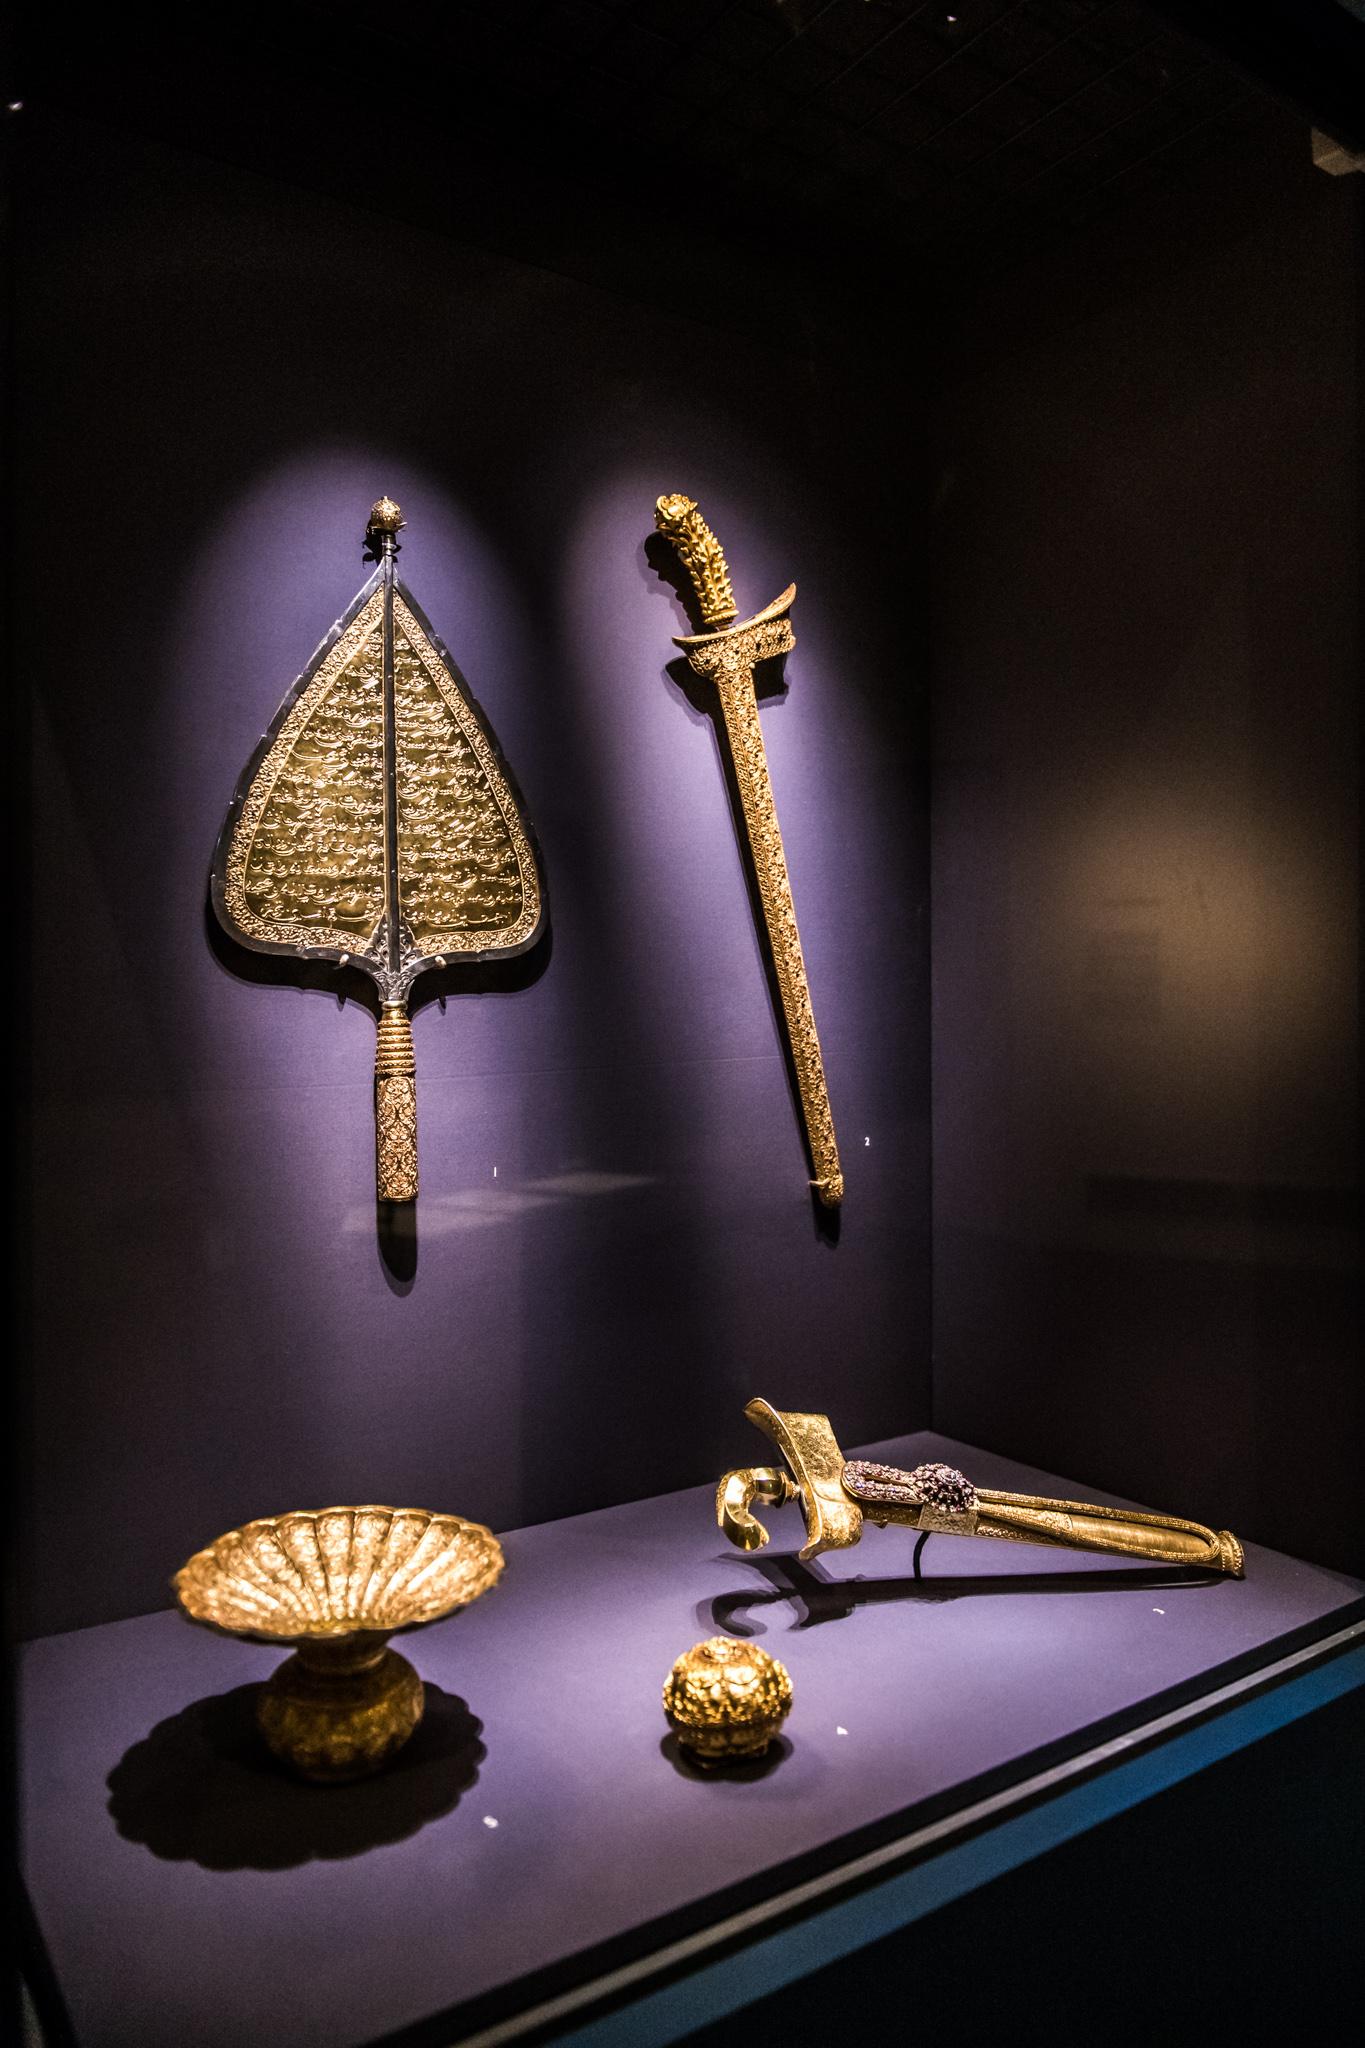 The Johor-Riau-Lingga royal regalia. © Asian Civilisations Museum